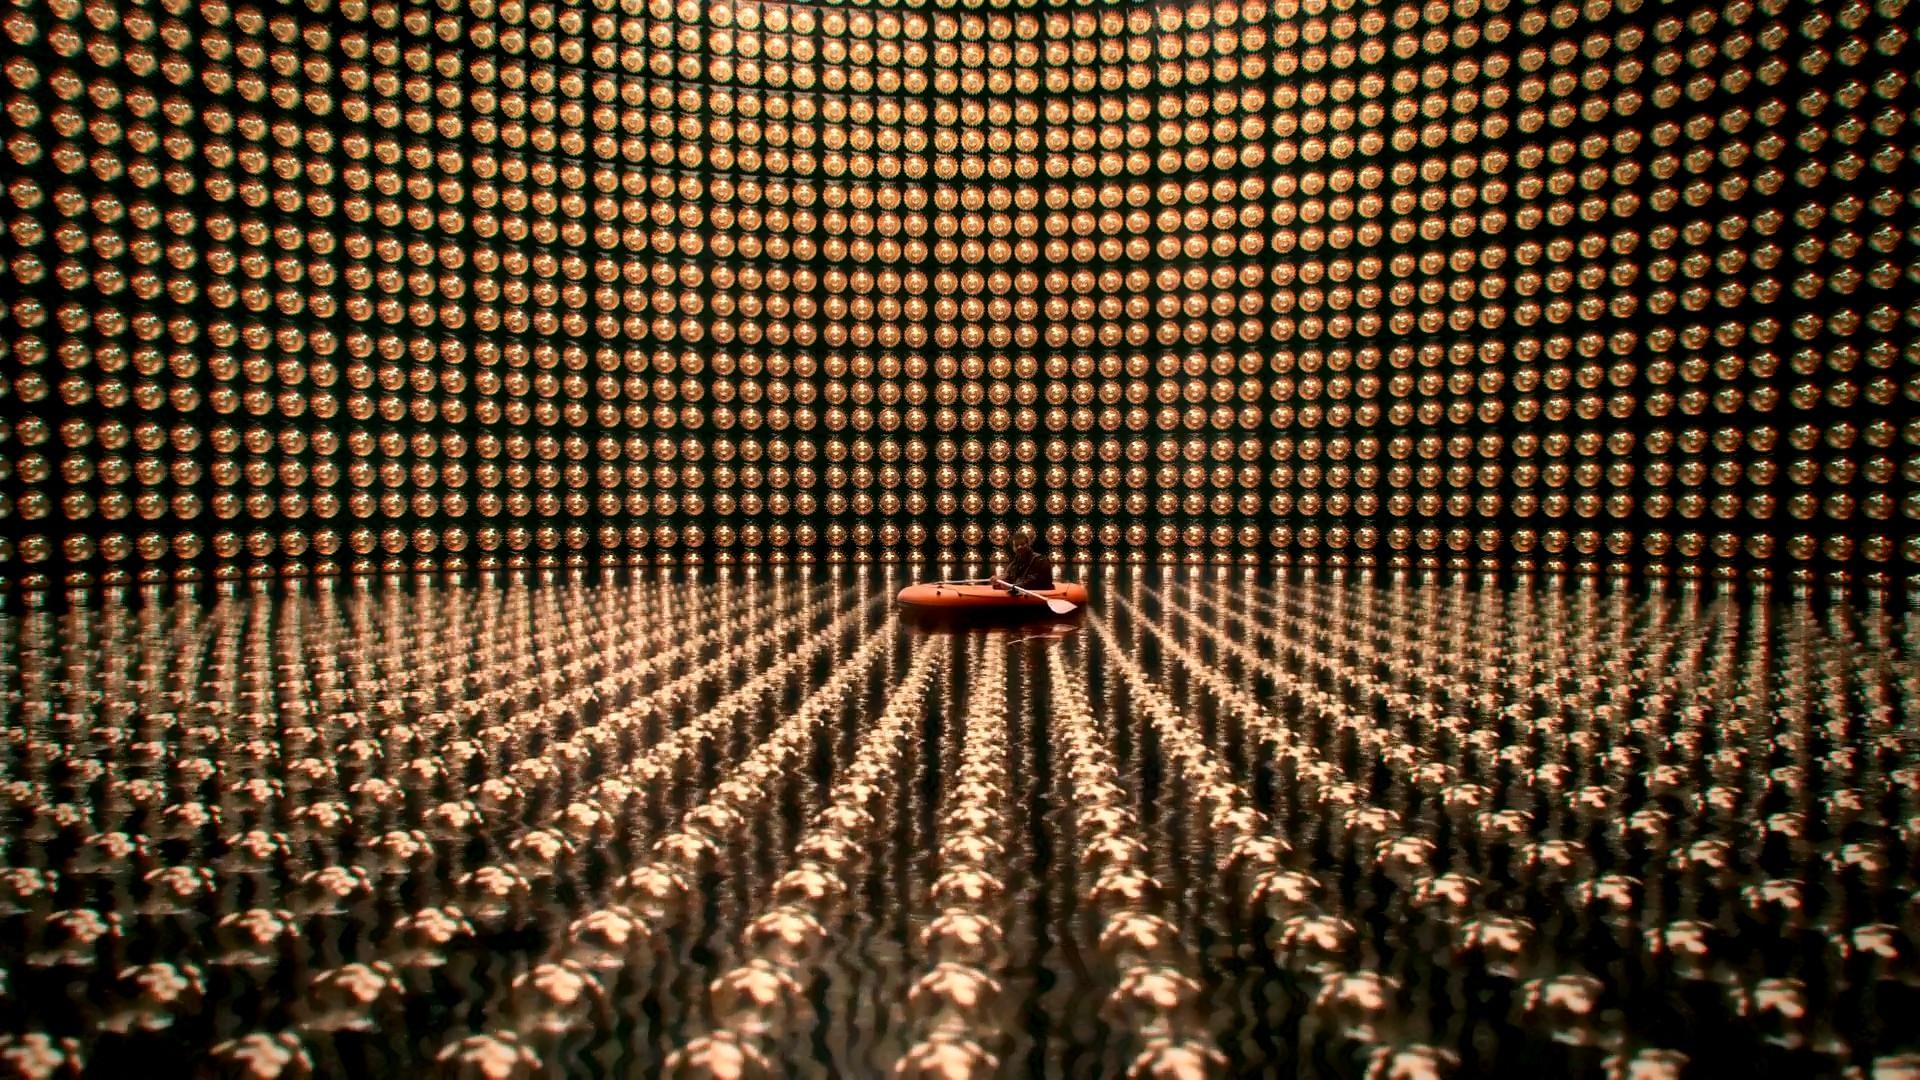 Super Kamiokande Neutrino Detector [2560x1600] wallpaper 1920x1080